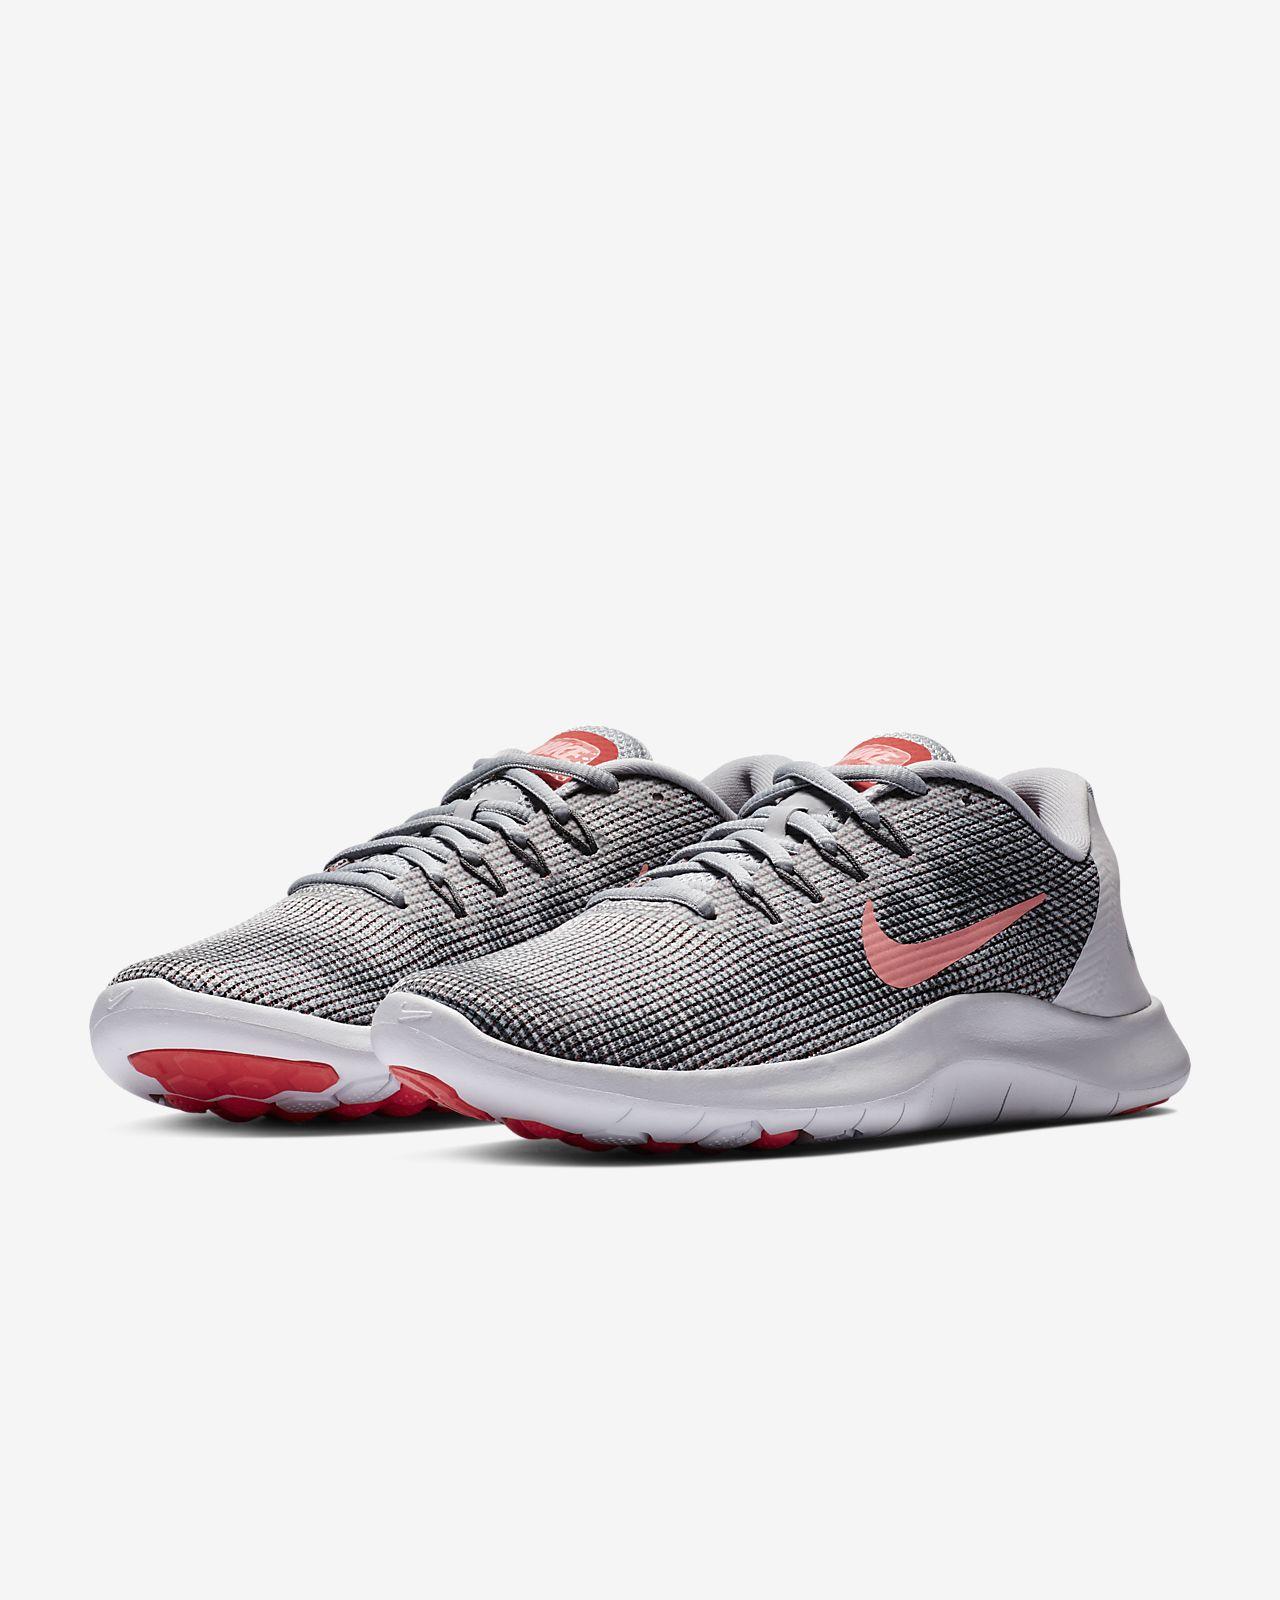 d08123e9f386 Nike Flex RN 2018 Women s Running Shoe. Nike.com CA